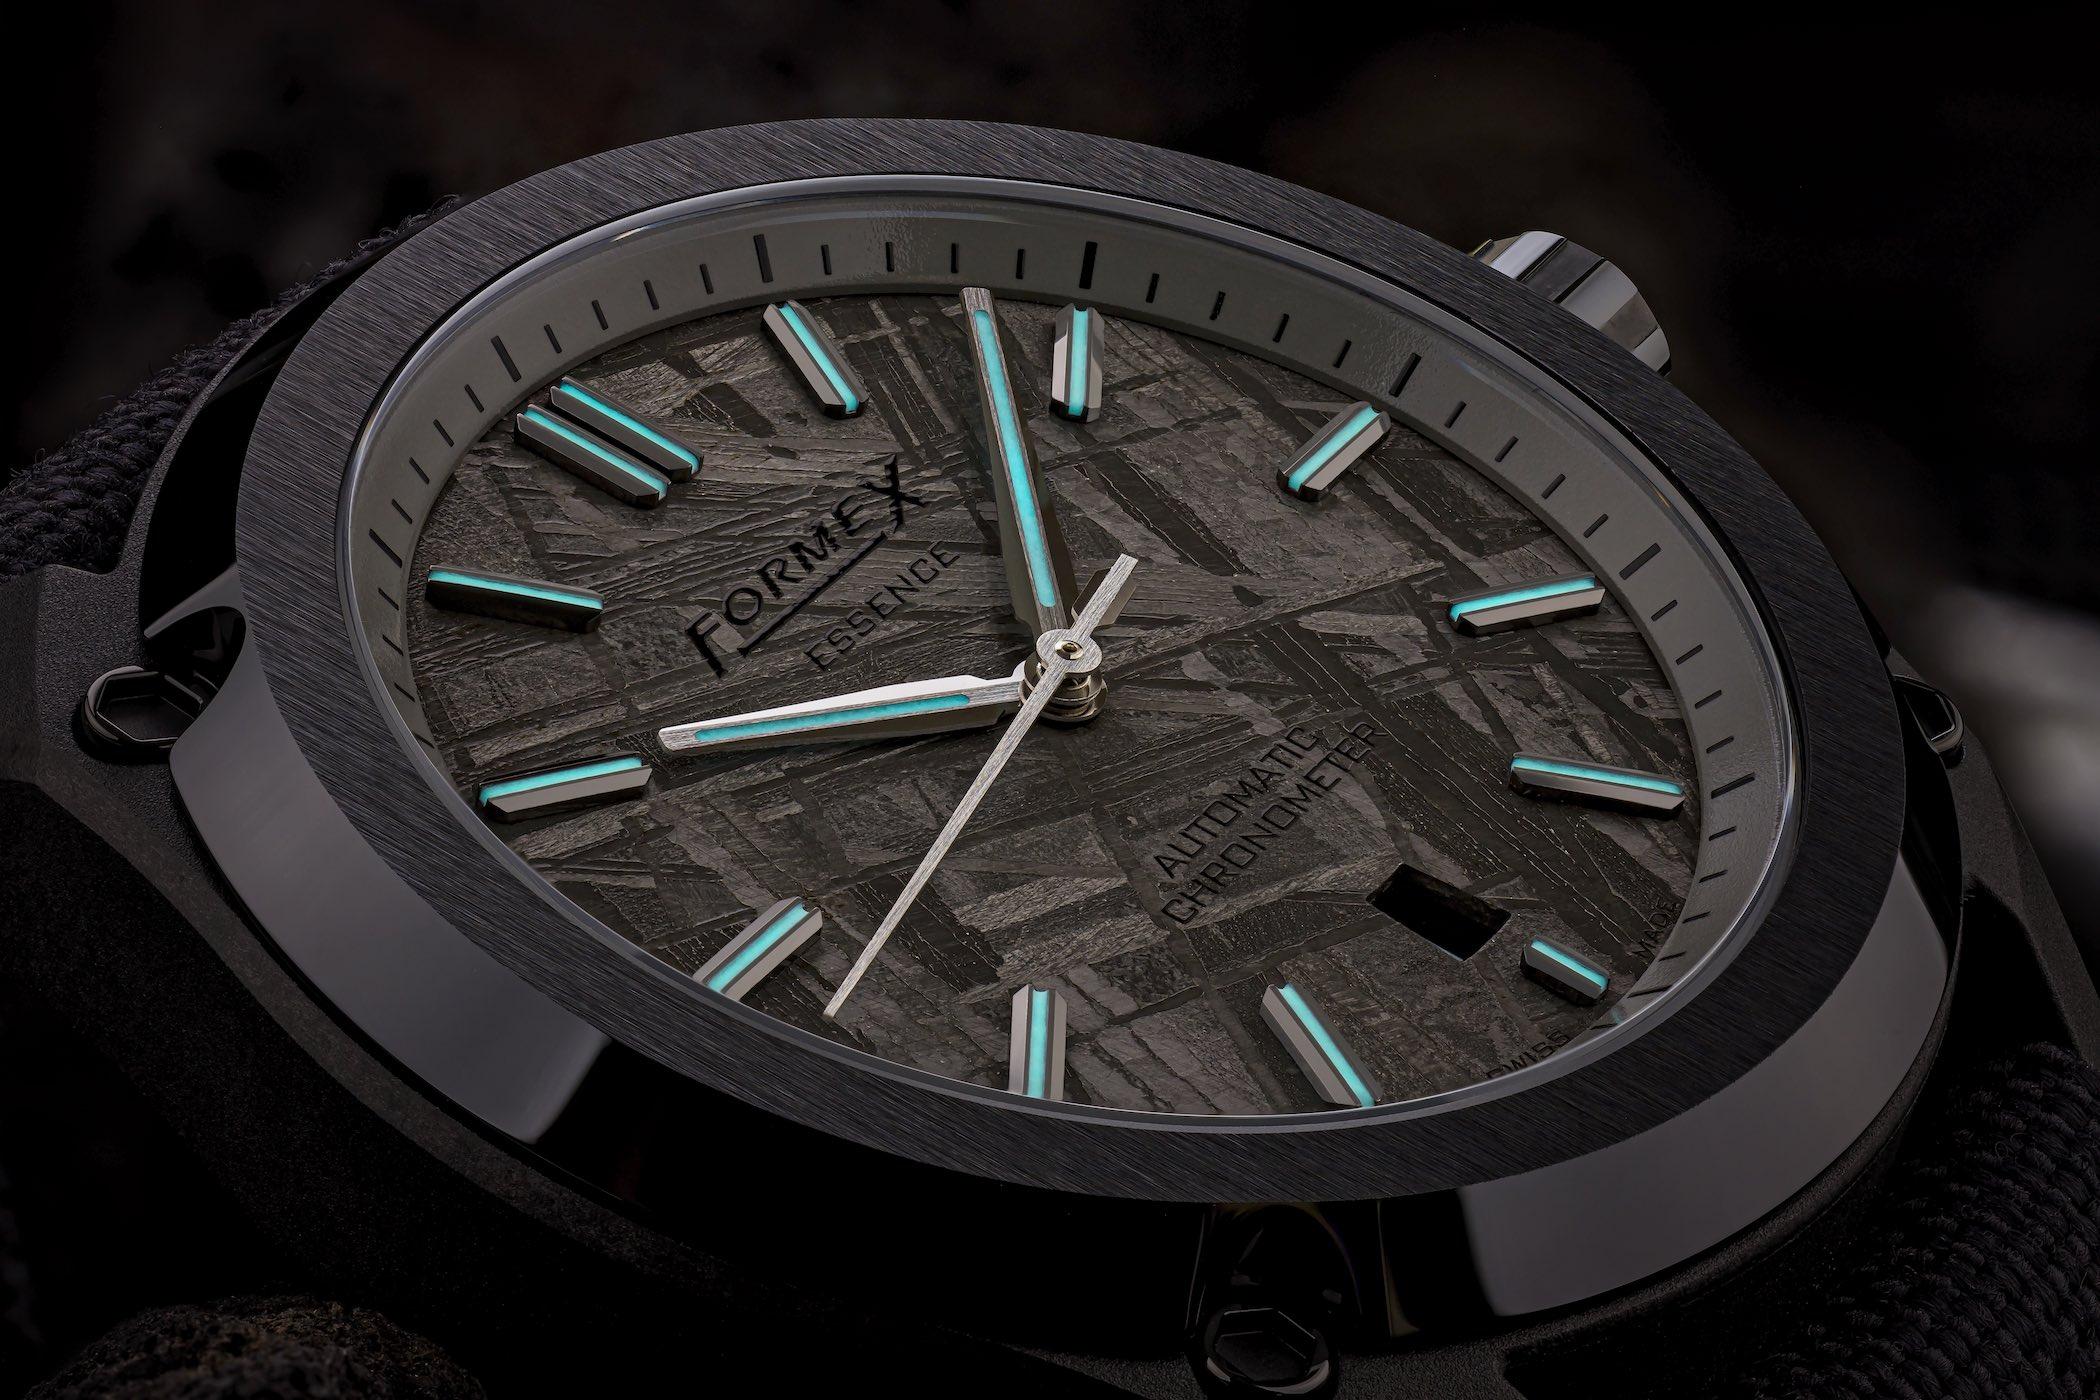 Formex Essence Space Rock Automatic Chronometer